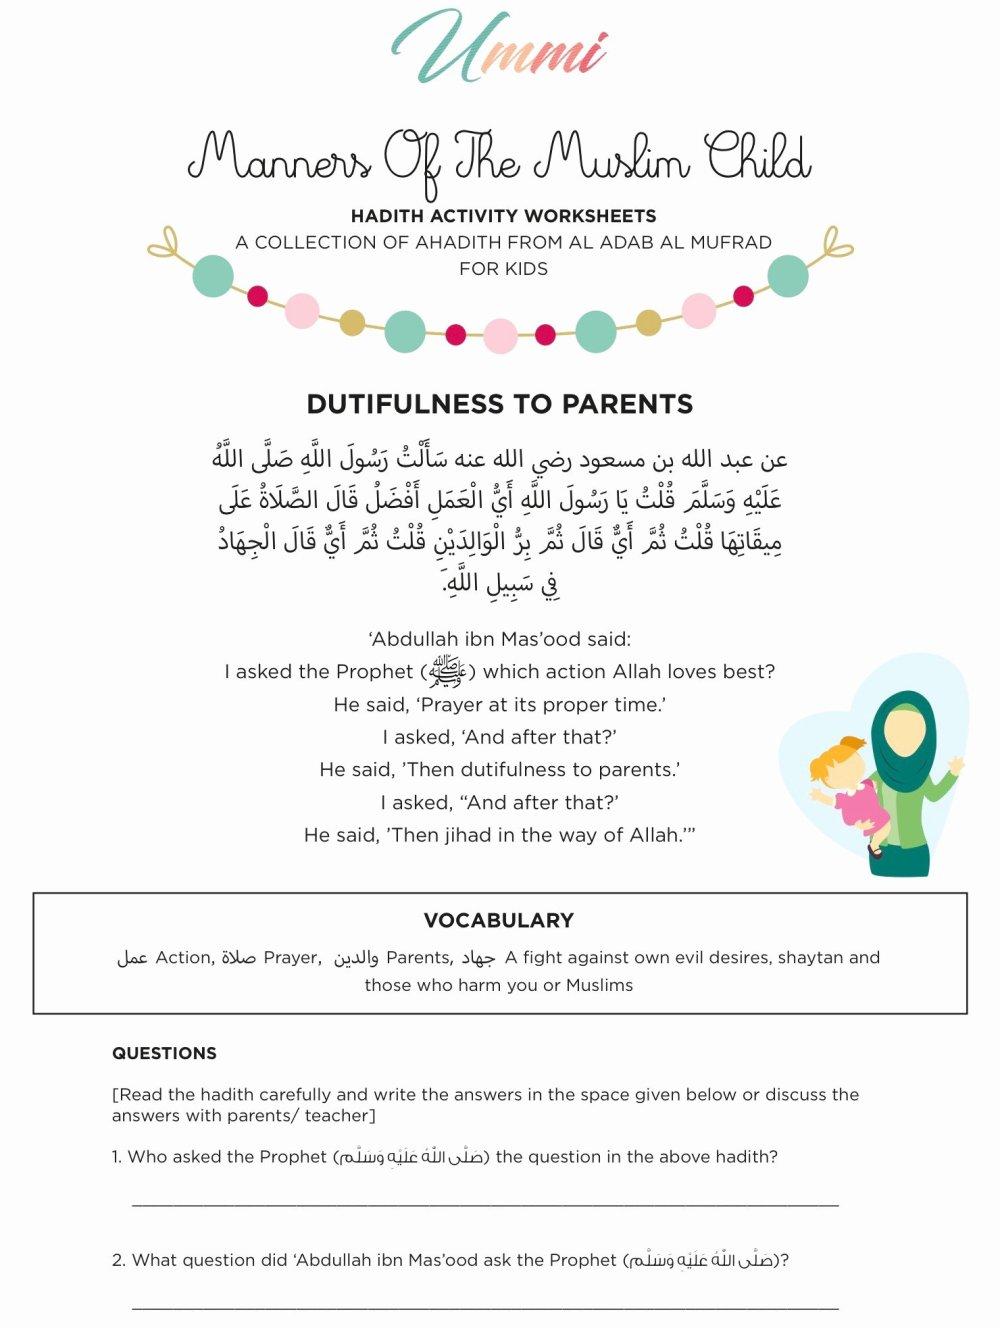 medium resolution of Islamic Worksheets for Preschoolers Beautiful Hadith Activity Worksheets  for Kids – Ummi – islamic – Printable Worksheets for Kids